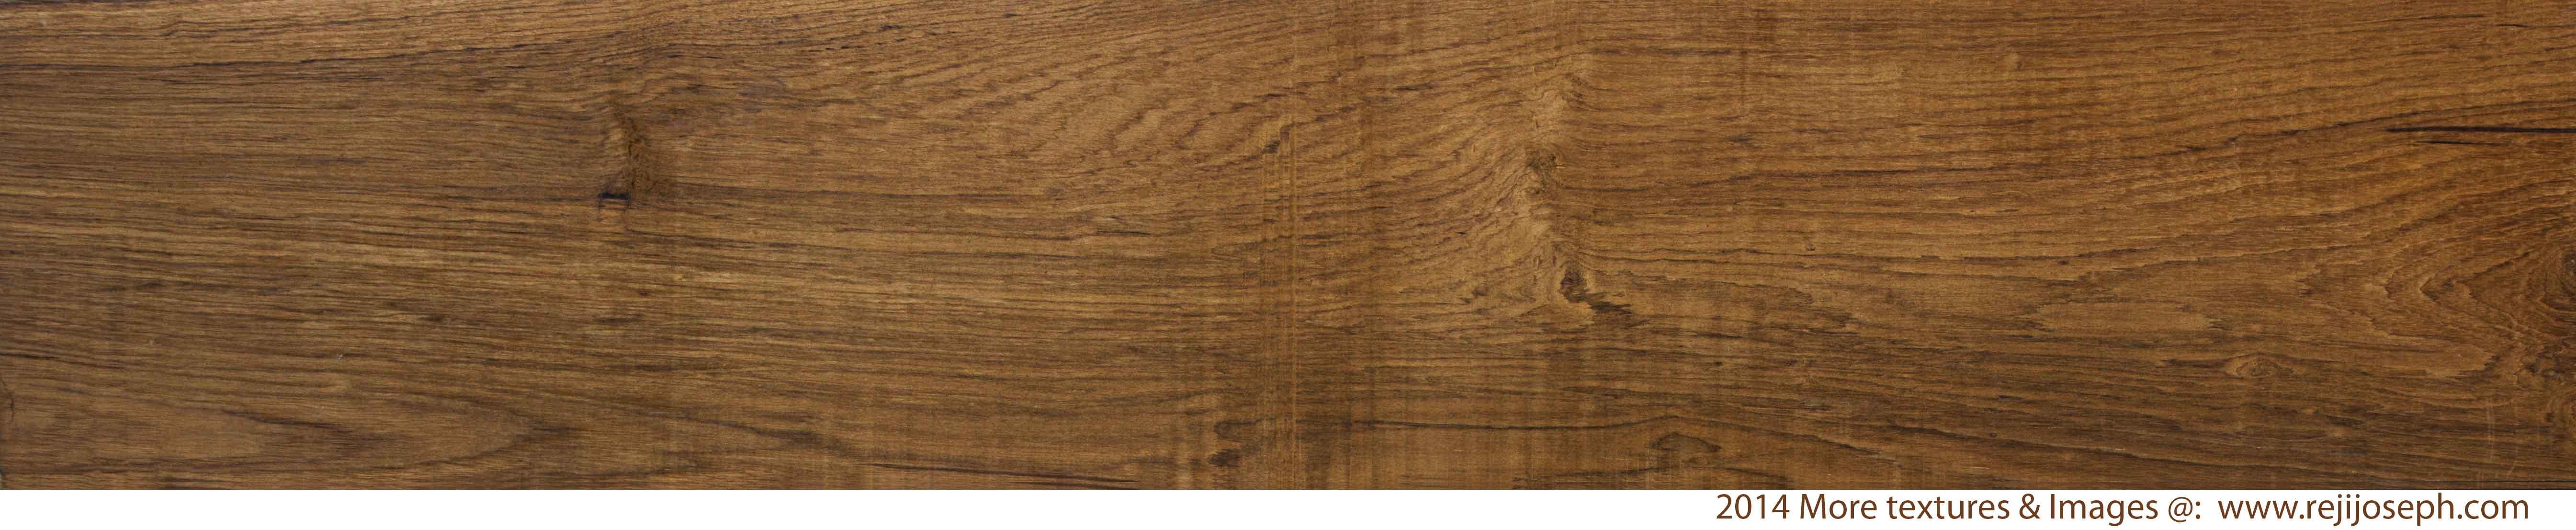 Plane Wood texture 00009